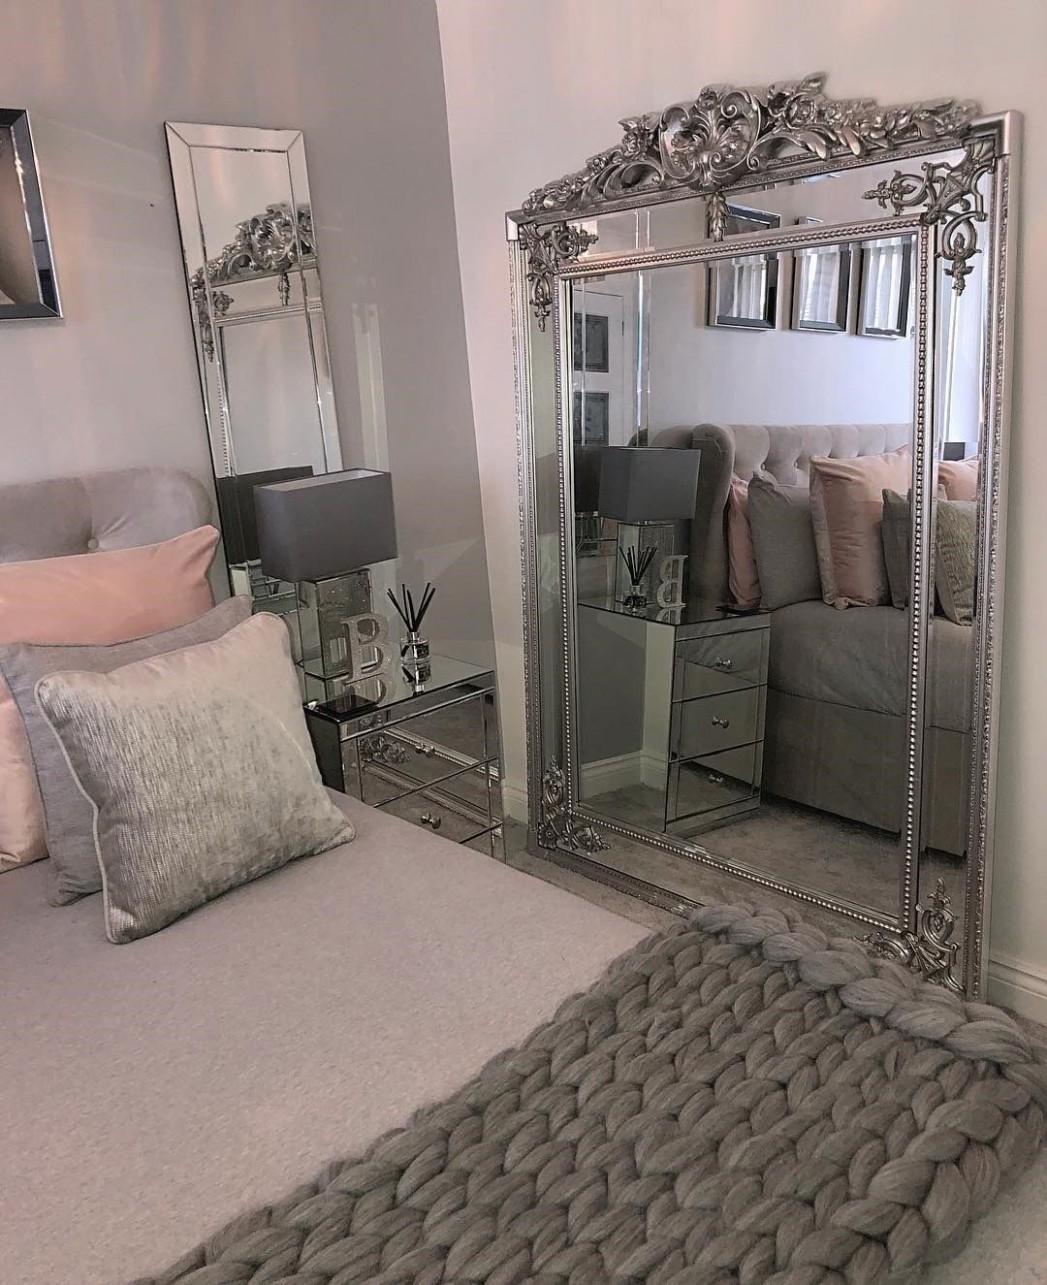 pinterest: @ nandeezy †  Home decor, Home, Bedroom decor - Bedroom Ideas Pinterest Grey